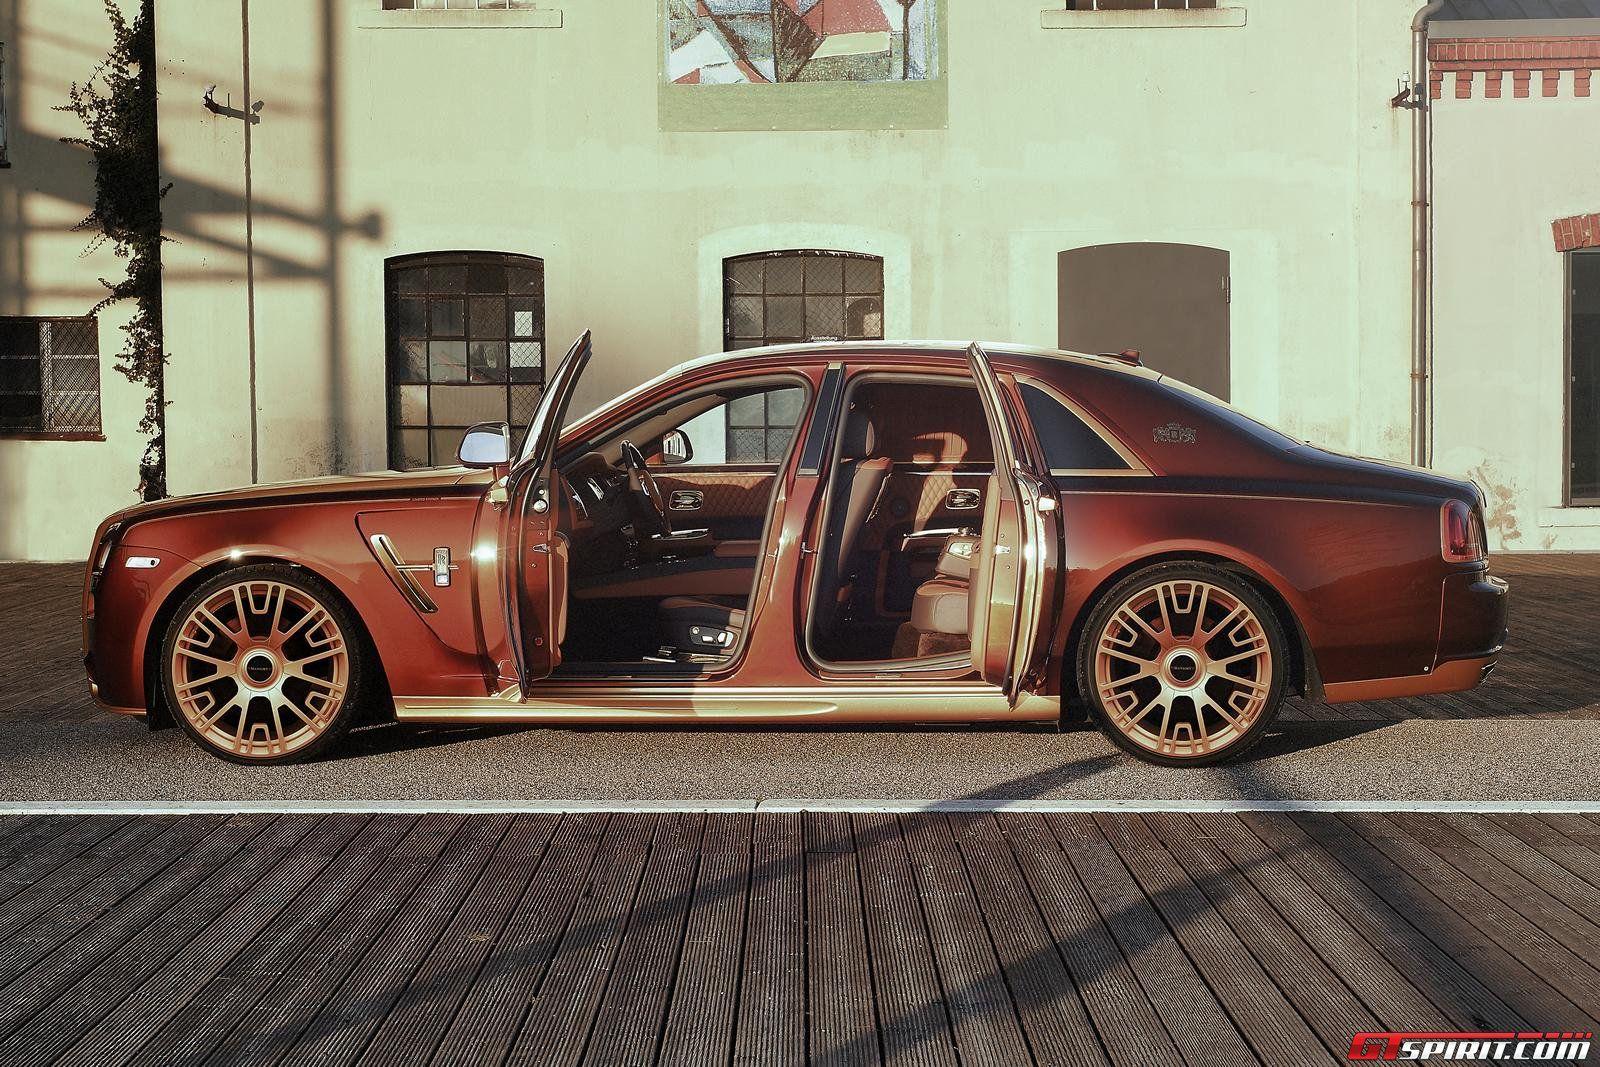 Official Mansory Rolls Royce Ghost Series Ii Auto Rolls Royce Rolls Royce Royce